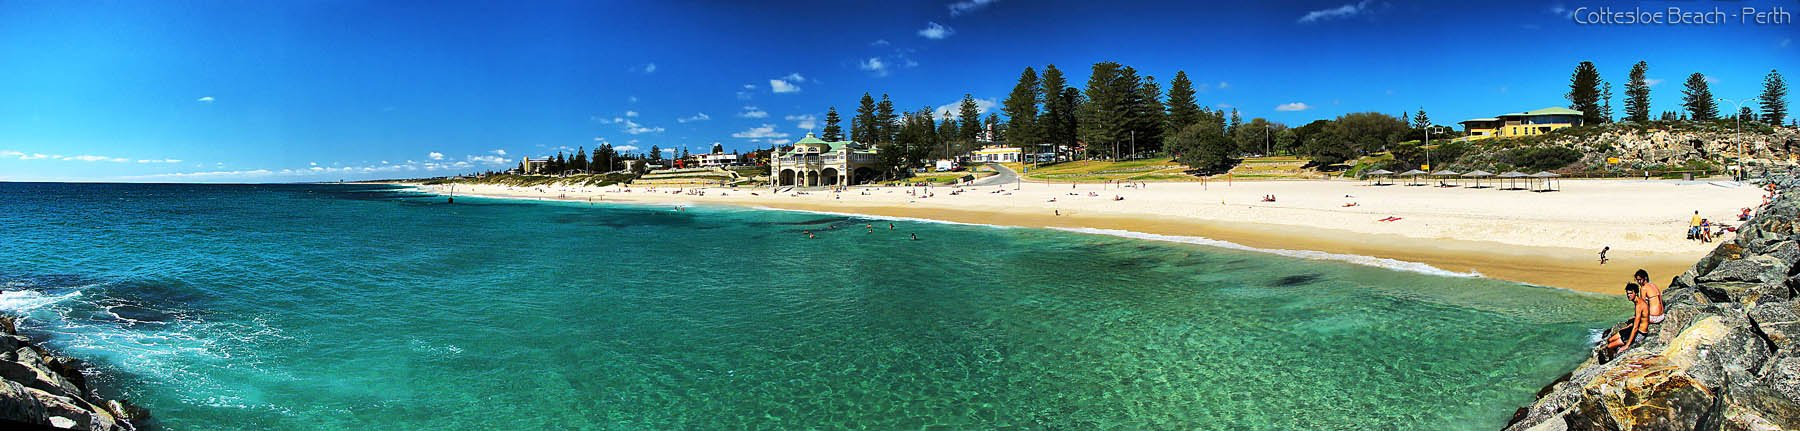 Cottosloe Beach-Perth.jpg